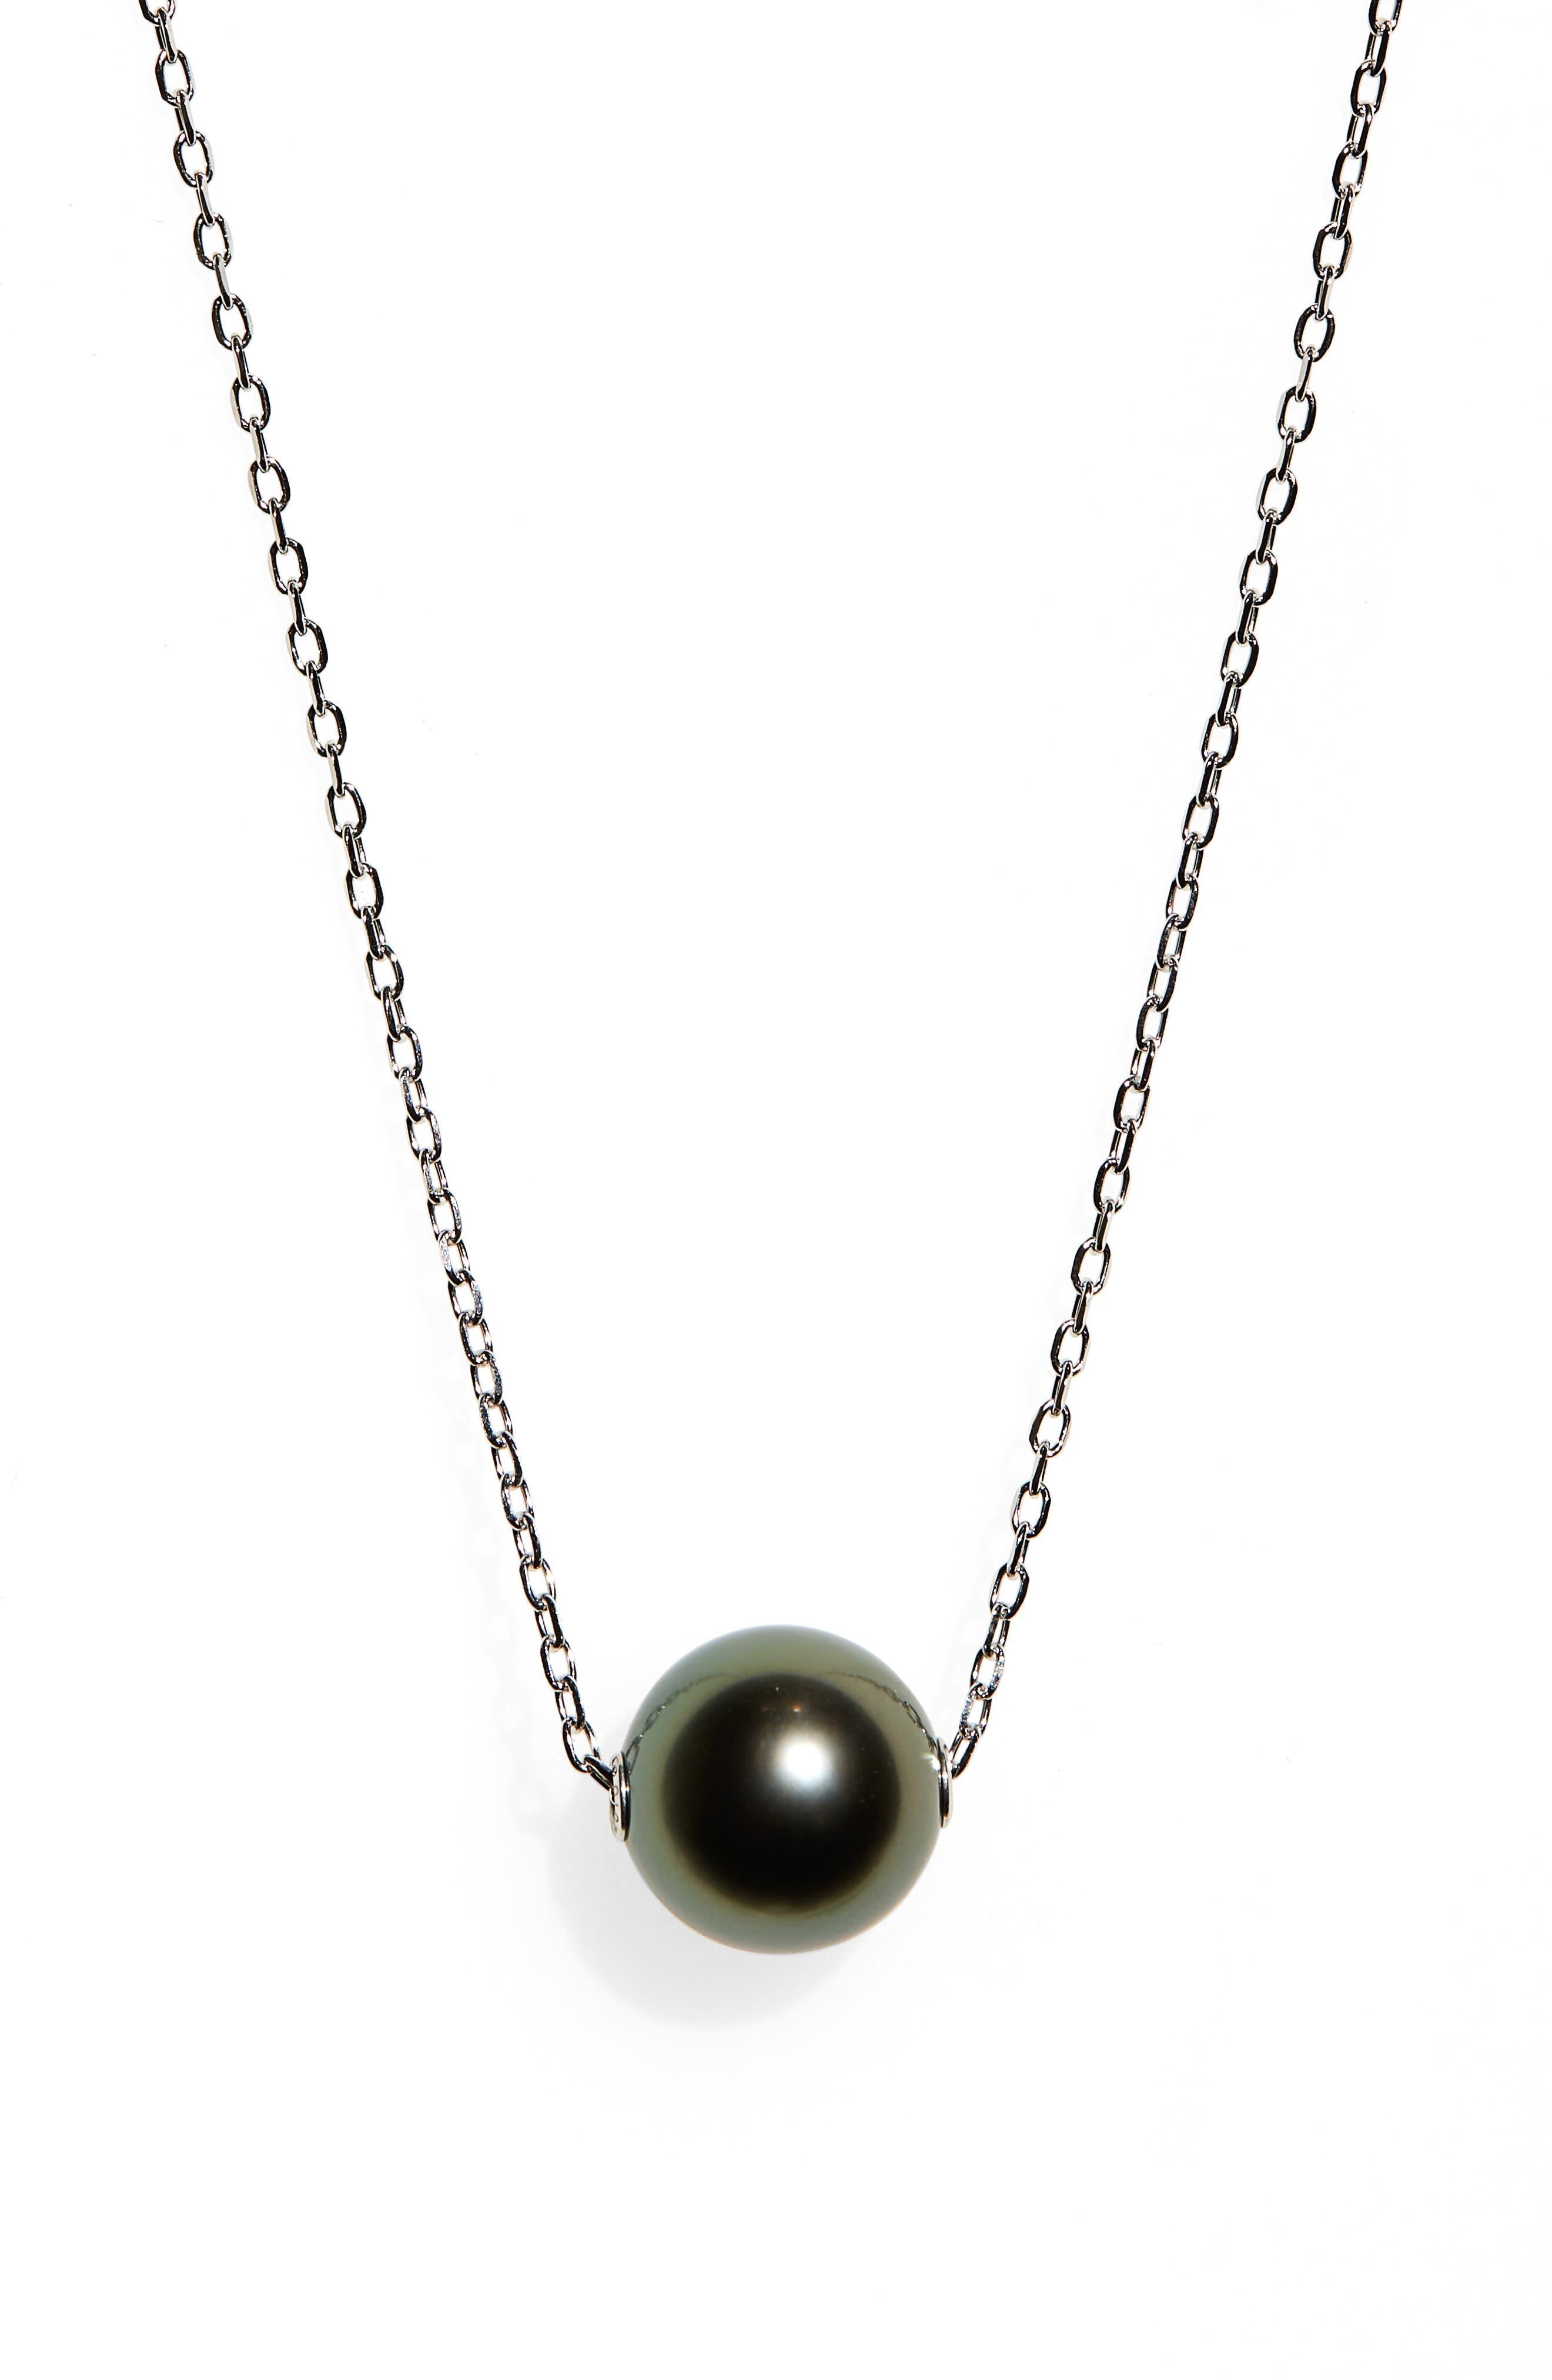 Japan Black Pearl Necklace